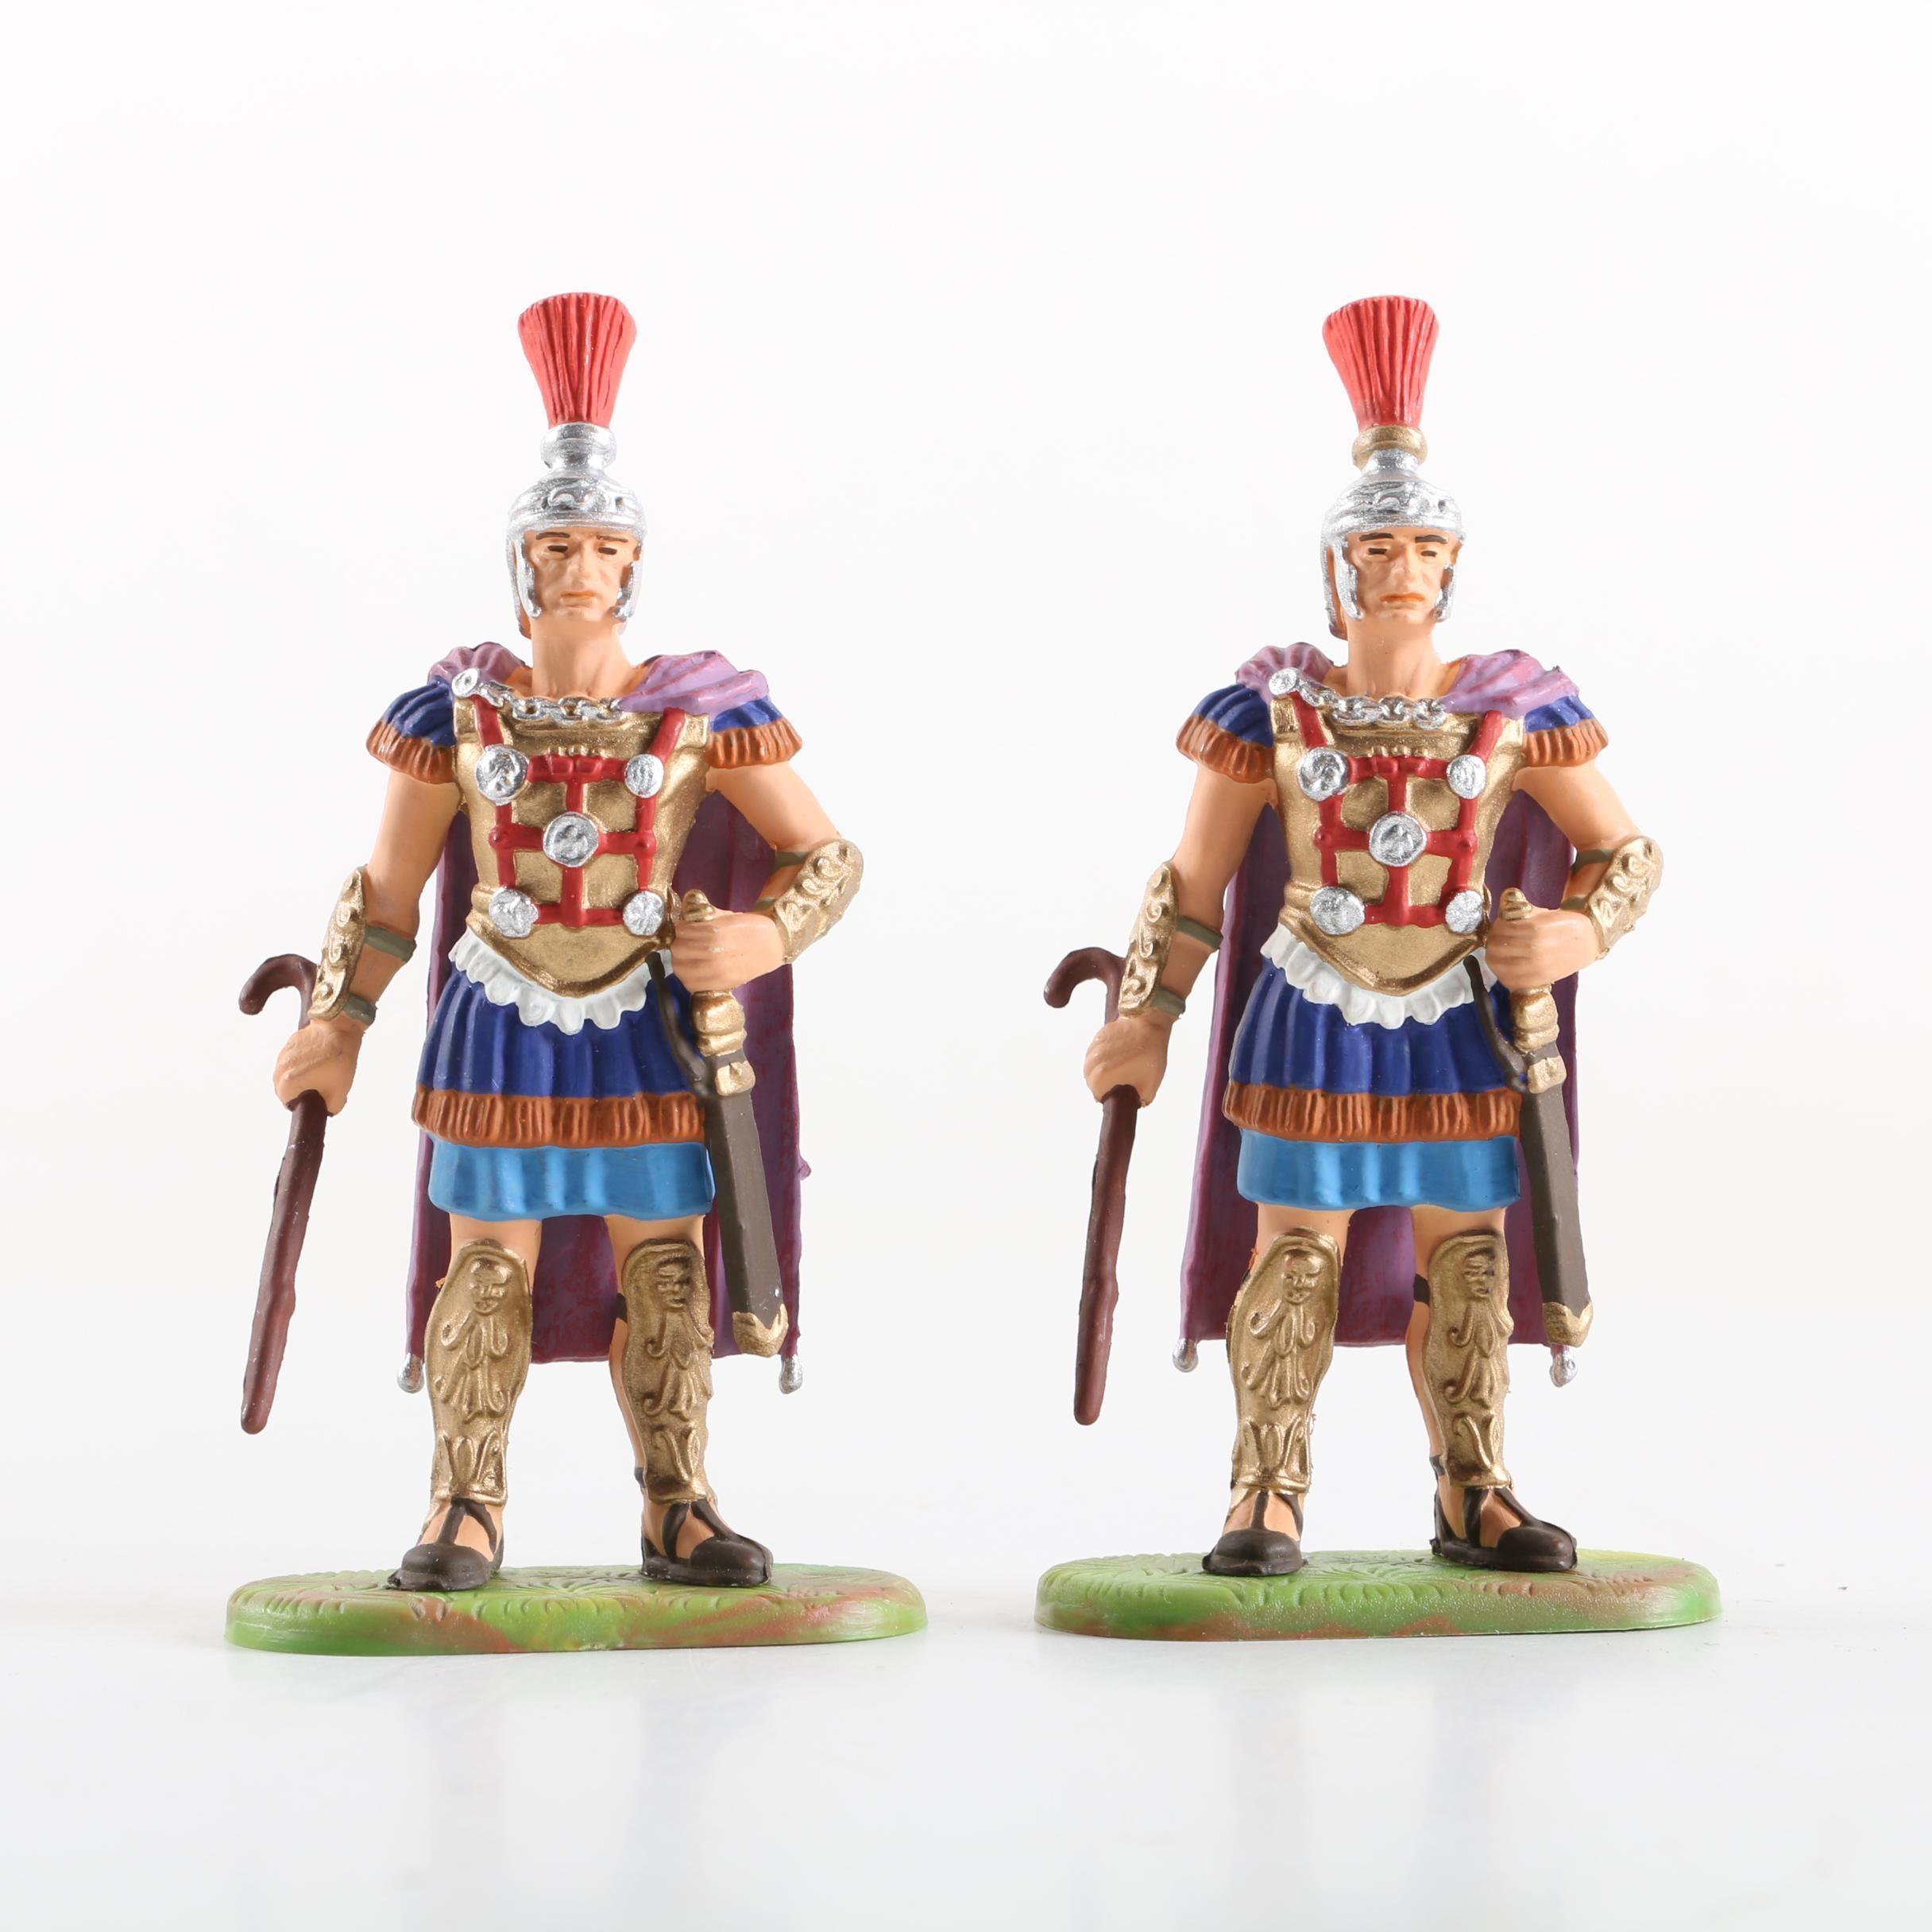 Hausser Elastolin German Plastic Roman Centurion Toy Soldiers